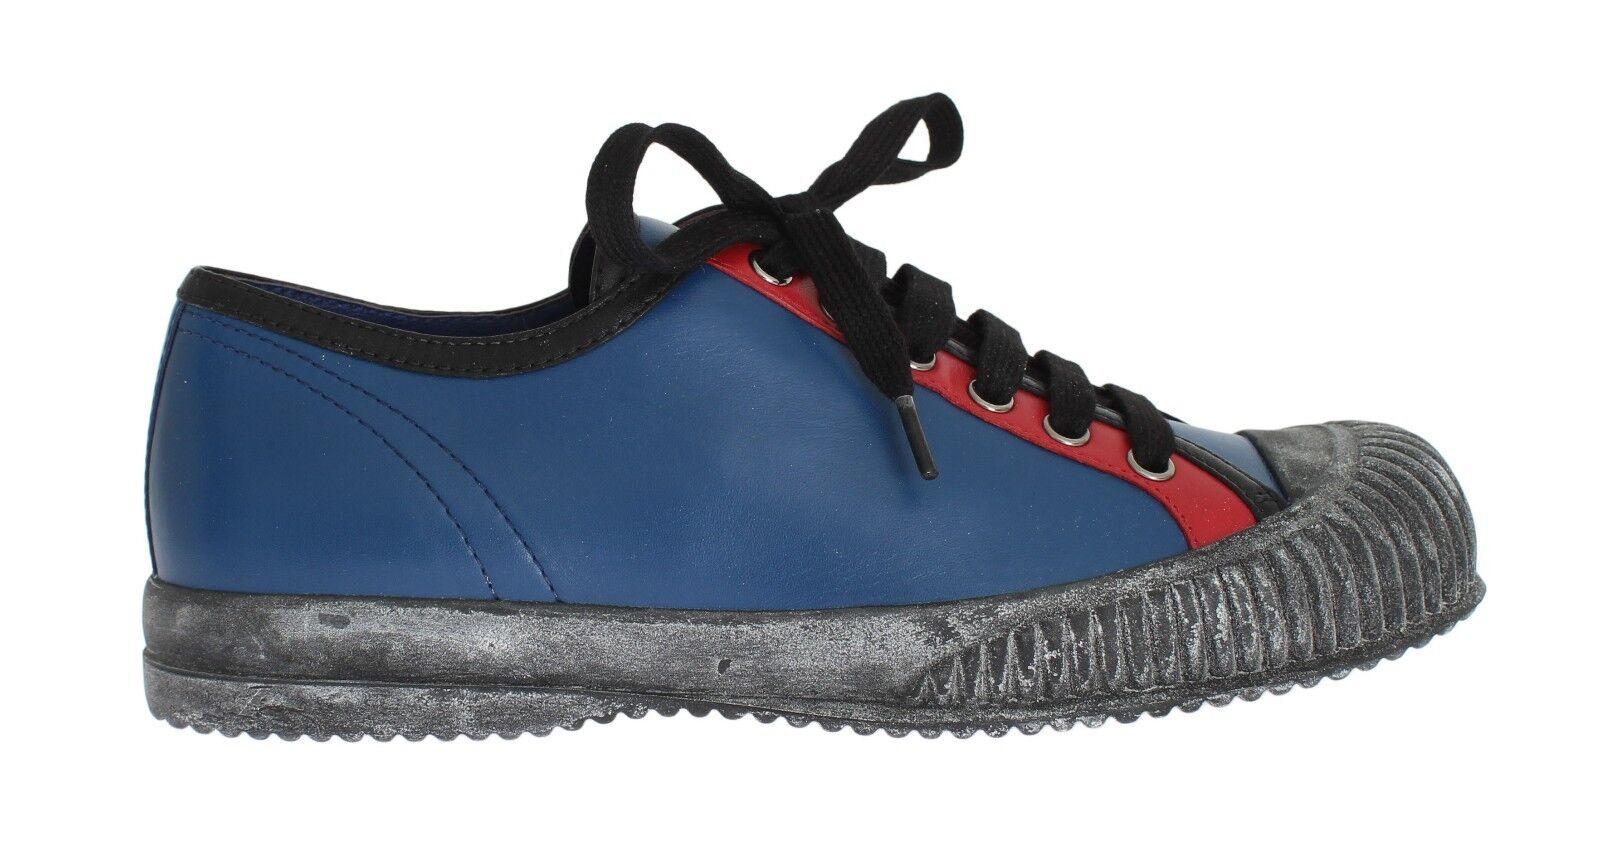 NEW  640 PRADA Shoes Scarpe da Ginnastica Donna Blue Leather Vitello Soft w. EU36 / US5.5